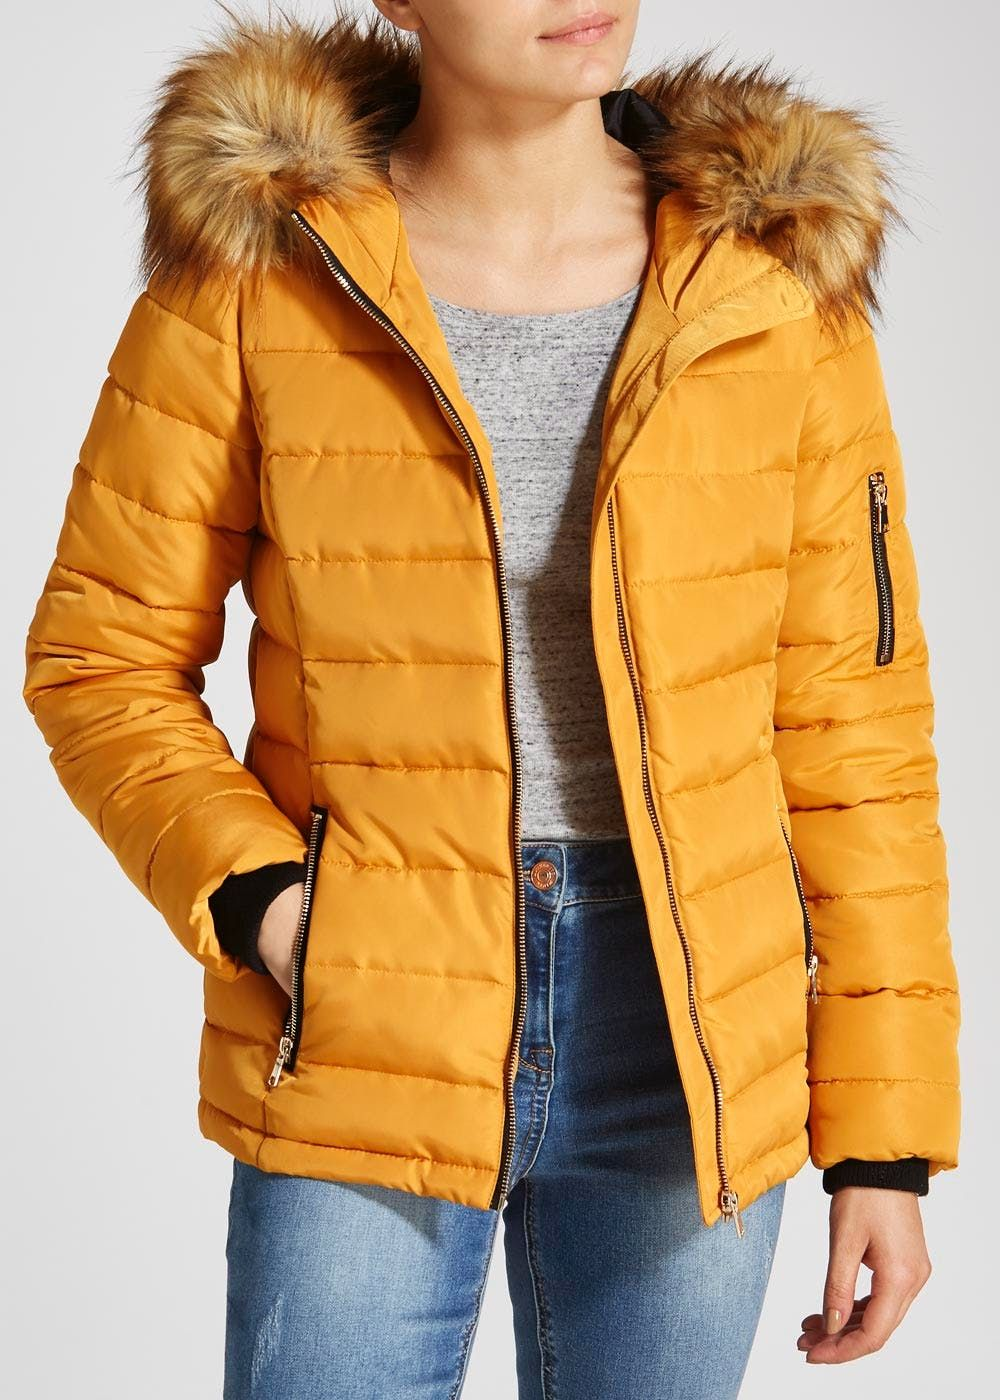 Faux Fur Hooded Short Padded Coat   Coats + Jackets   Coat, Faux fur, Winter jackets